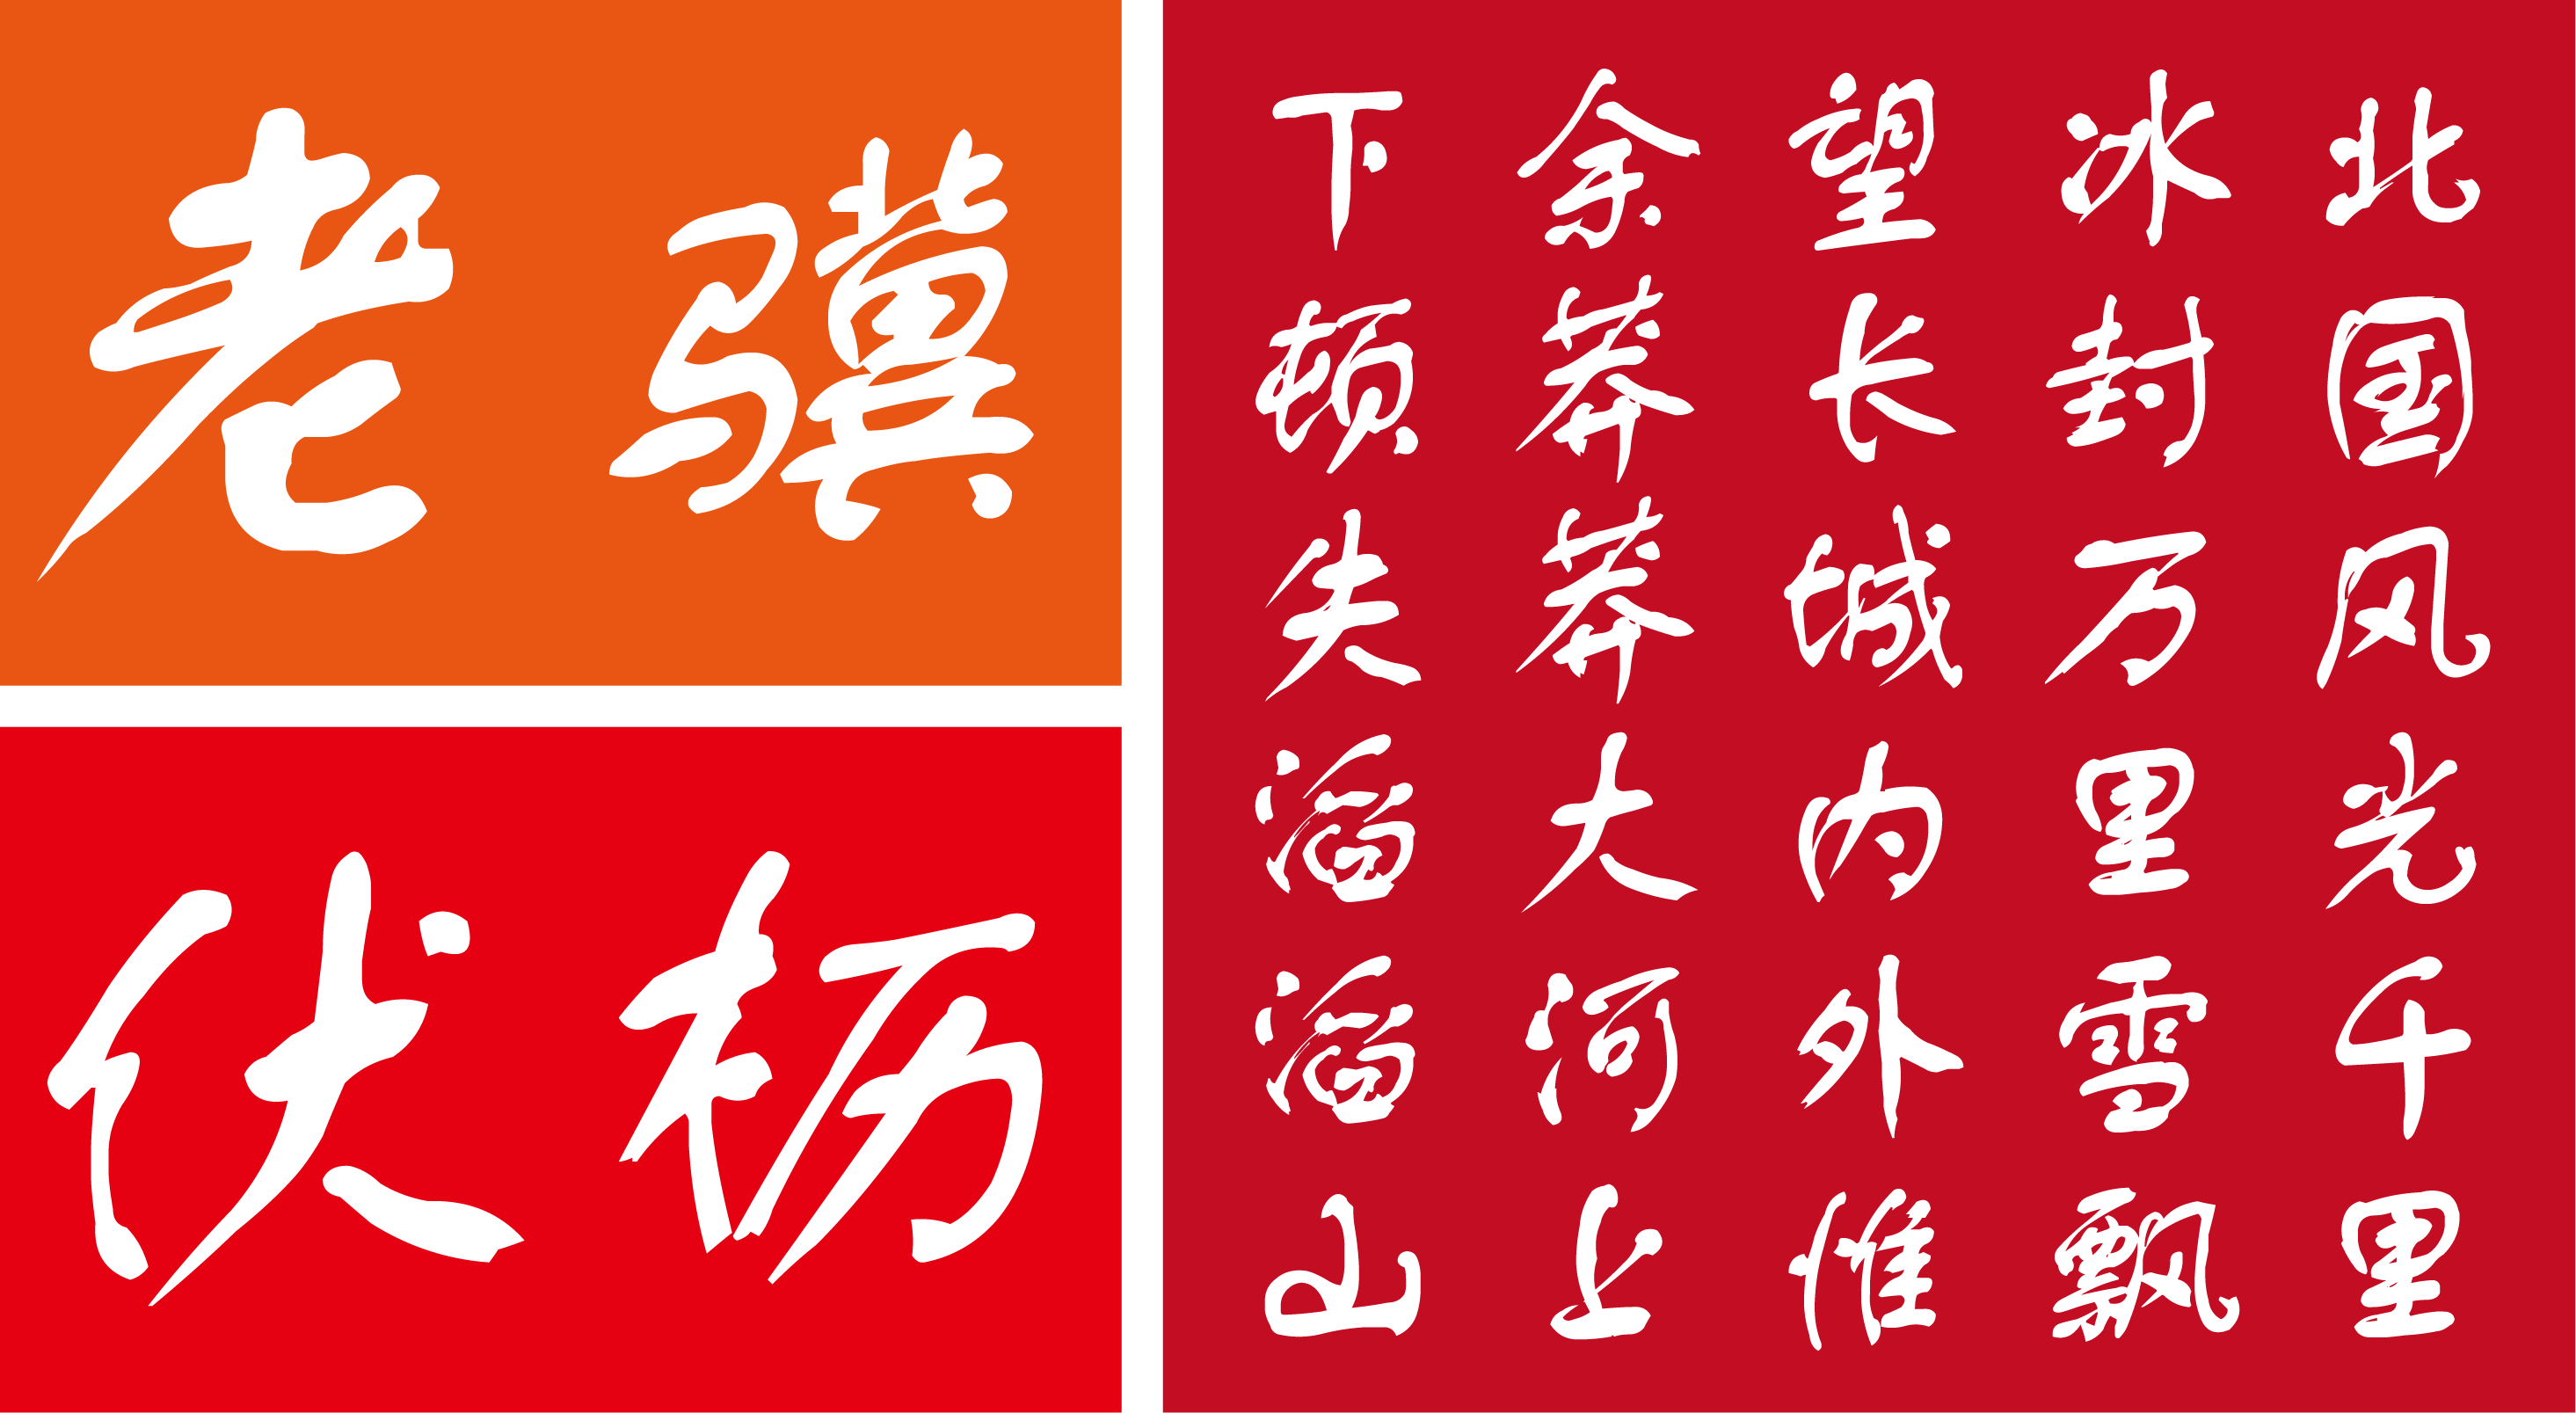 https://ft-bk1.oss-cn-zhangjiakou.aliyuncs.com/Public/Uploads/img/n_content_20201210174814_4755.png